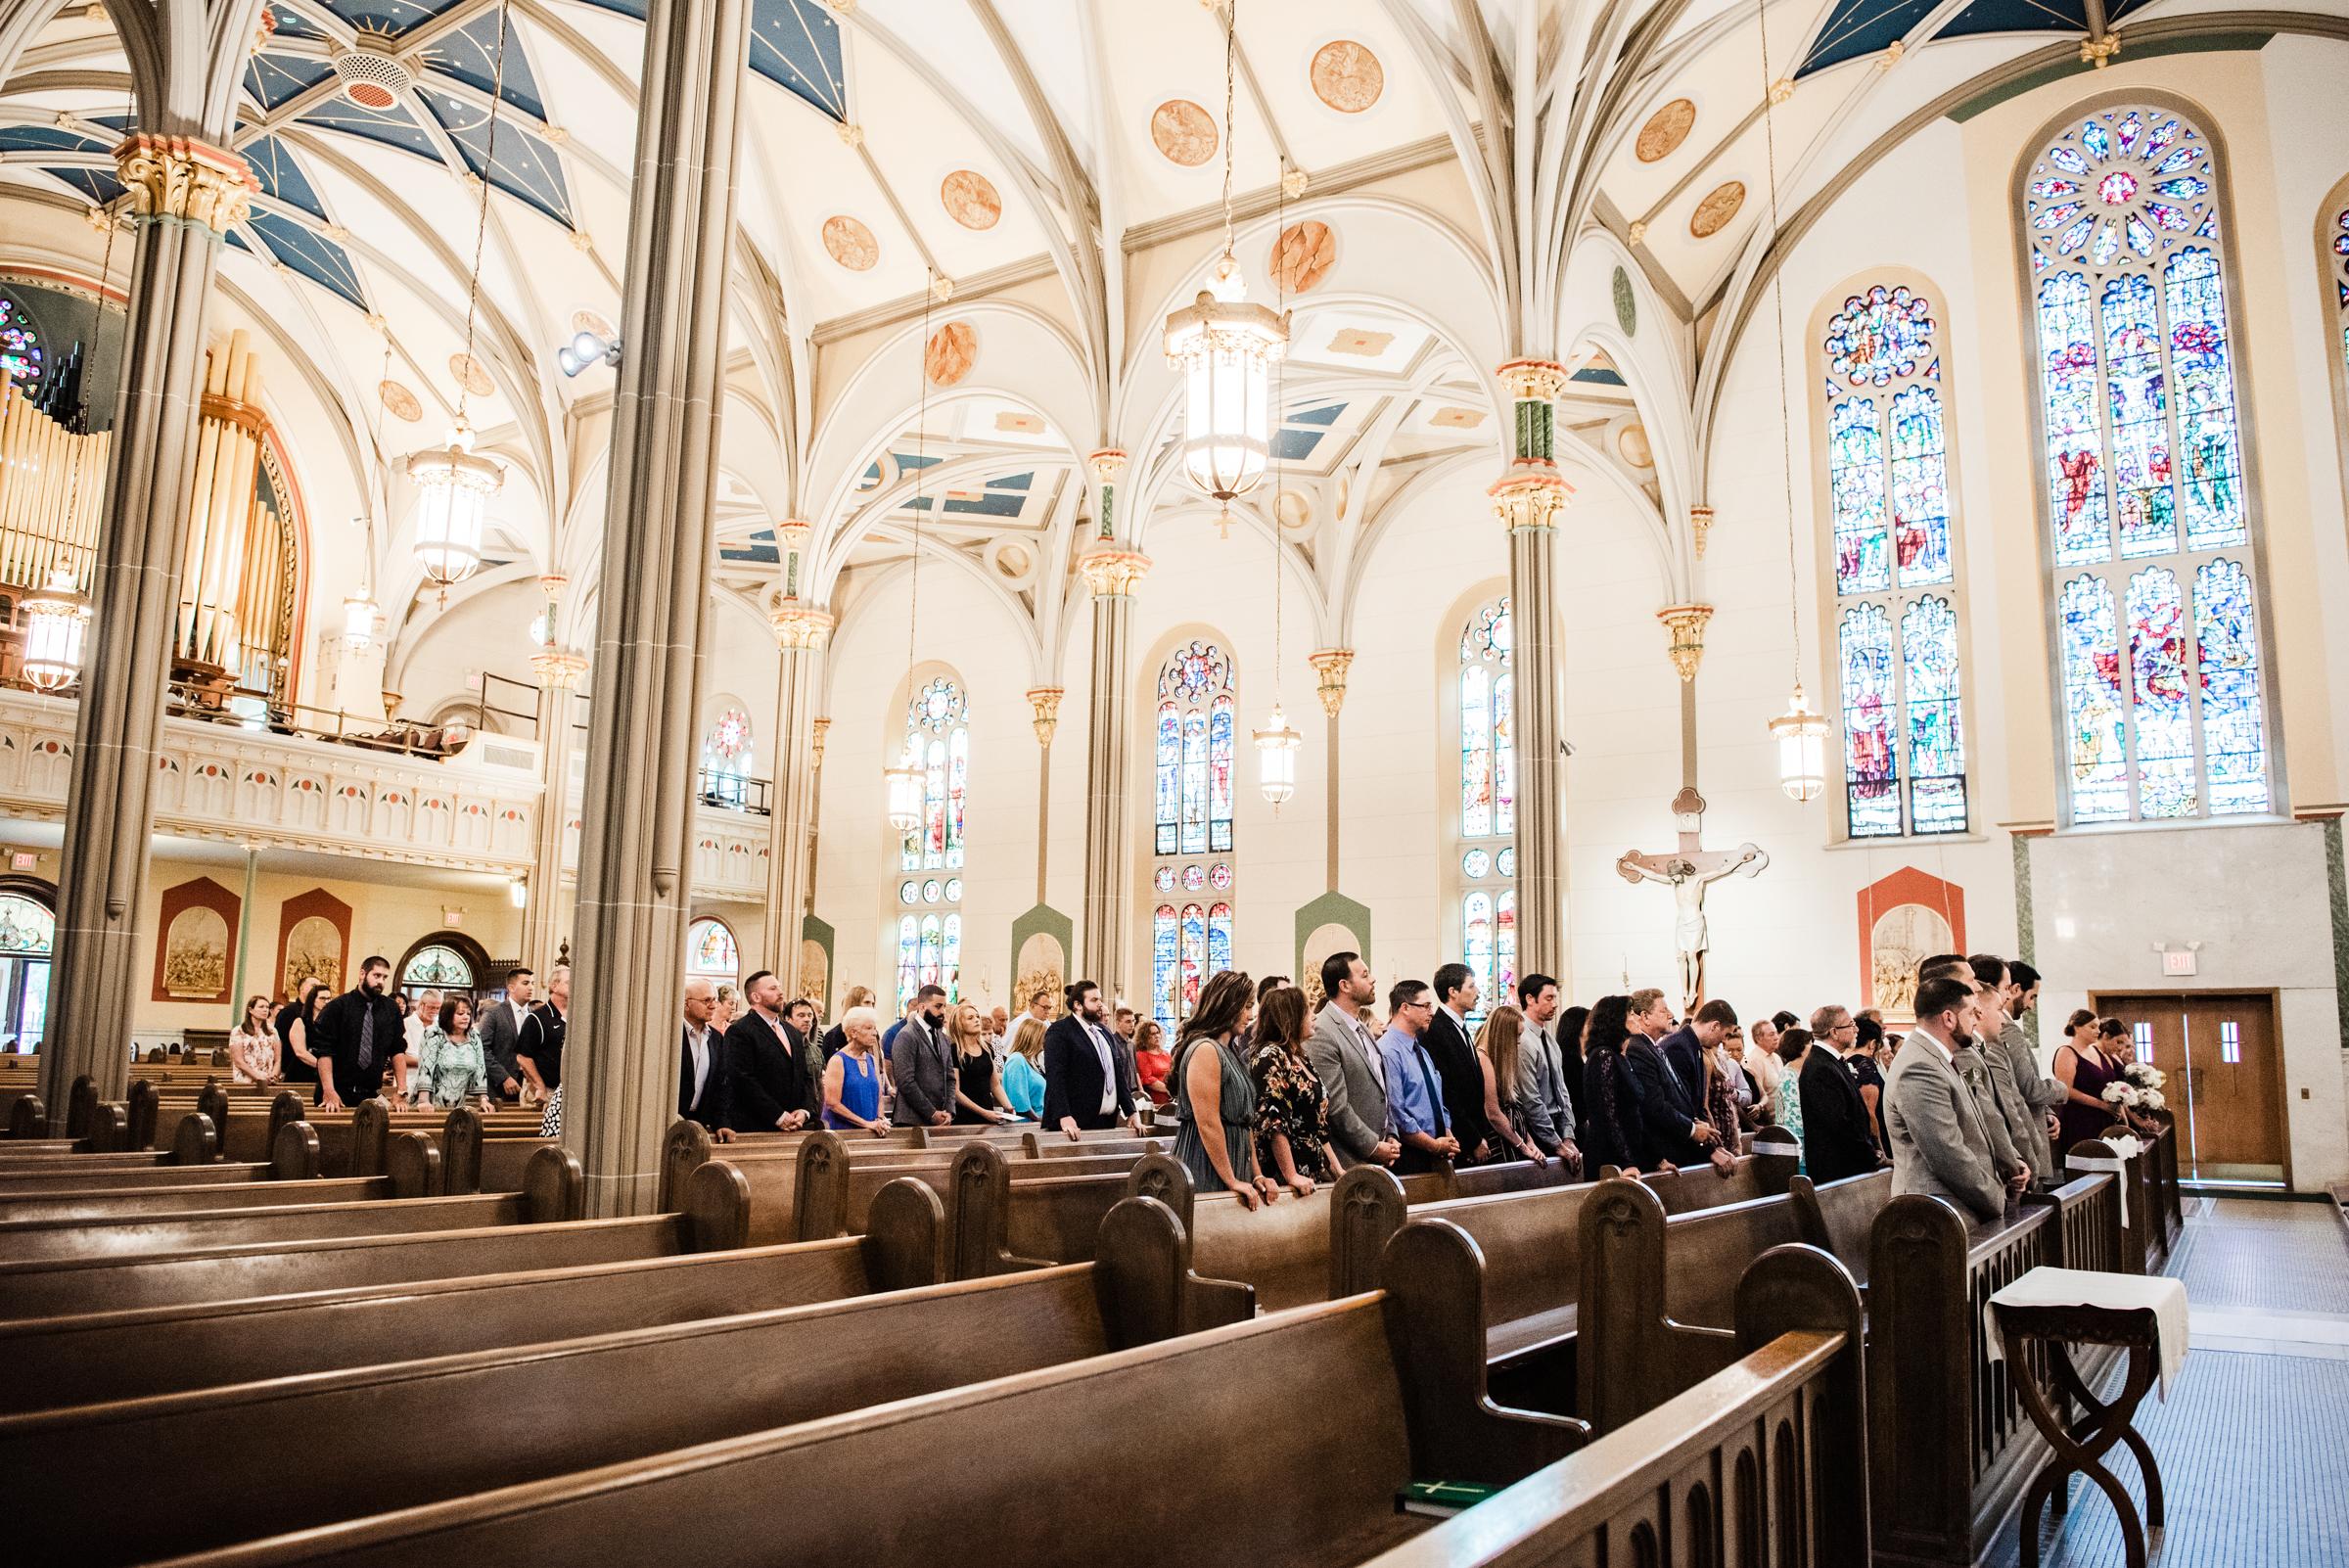 Historic_Old_St_Johns_Church_Valentinos_Banquet_Hall_Central_NY_Wedding_JILL_STUDIO_Rochester_NY_Photographer_DSC_5733.jpg